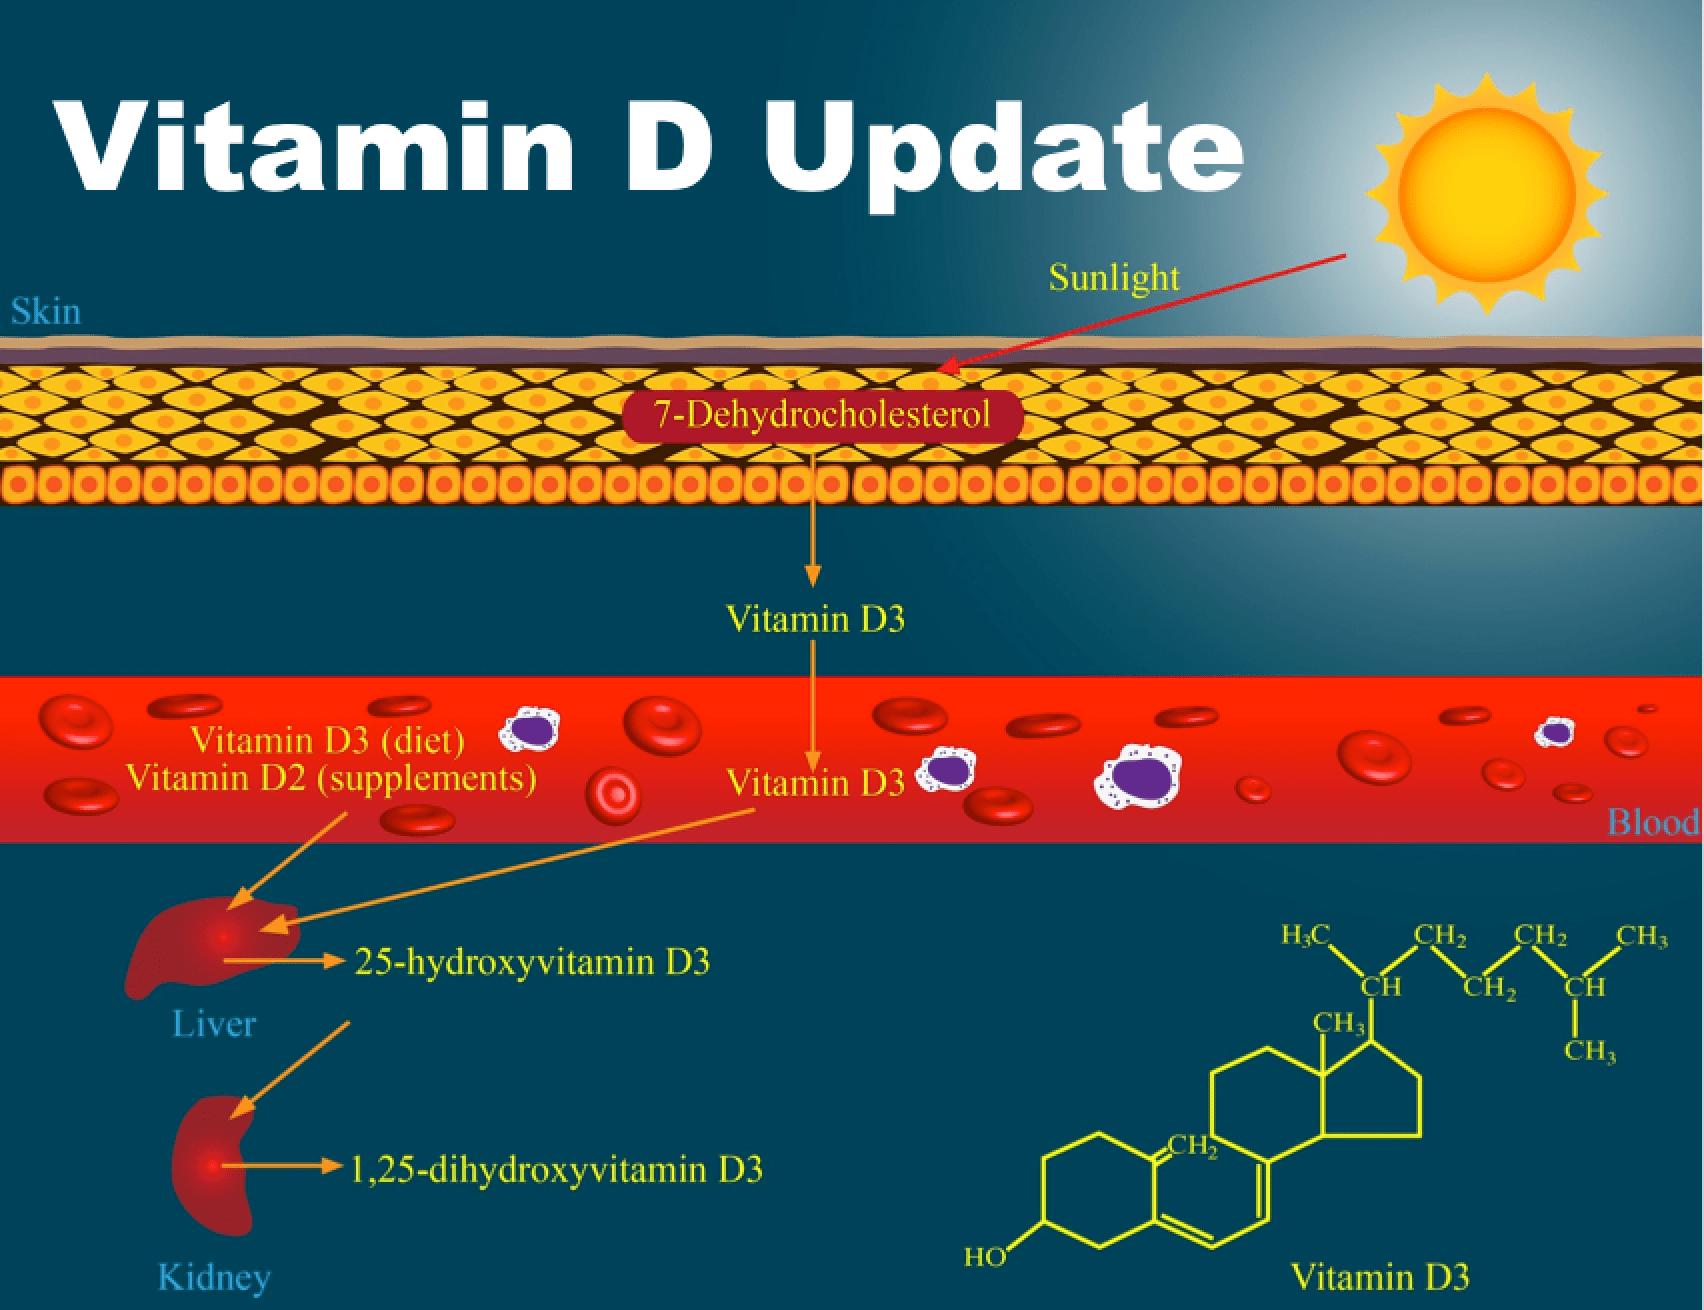 Caveman clipart vitamin d. Archives the bjj update